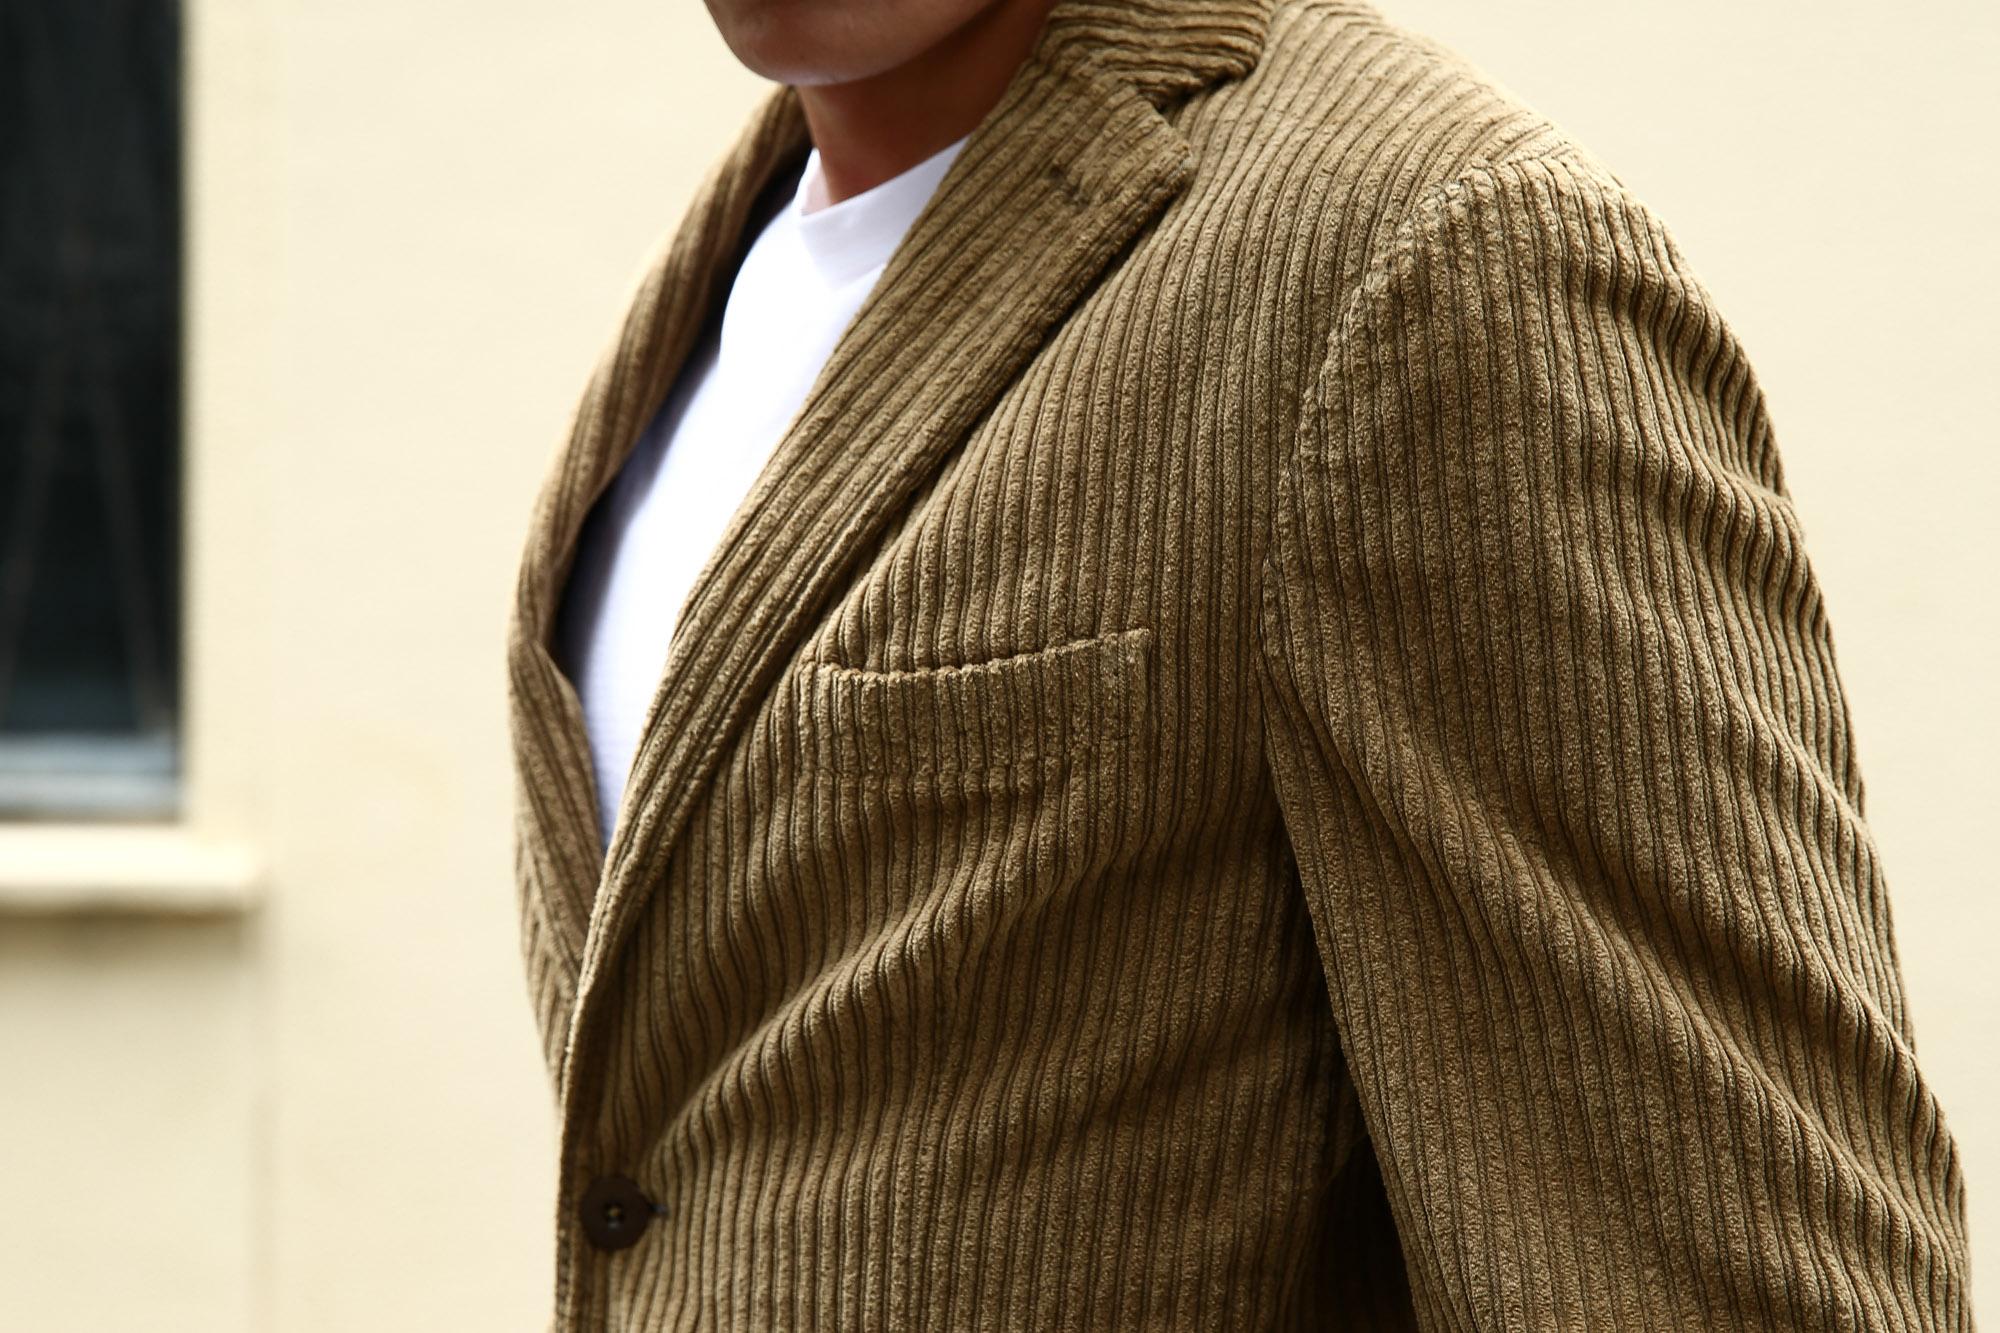 MONTEDORO (モンテドーロ) Corduroy 2B Jacket 2Bジャケット Wale Garment dyed Corduroy テーラード コーデュロイ ジャケット BEIGE (ベージュ・756) 2016 秋冬新作 のコーディネート画像。愛知 名古屋 ZODIAC ゾディアック